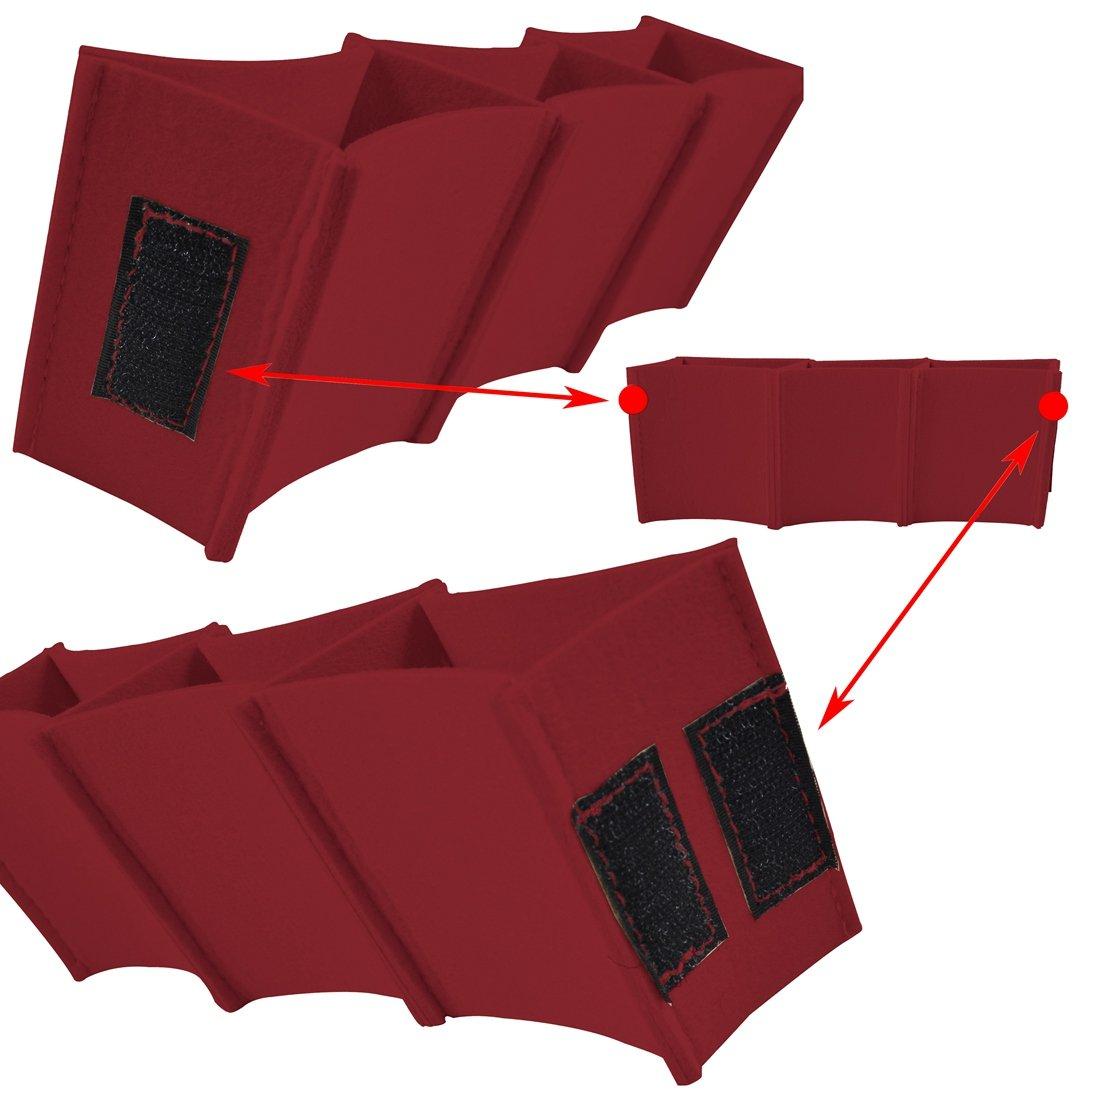 Xianheng Felt Insert Bag Organizer Multi-Pocket for Handbag Purse Tote Grey M ZB0807-3-2M//XHCA